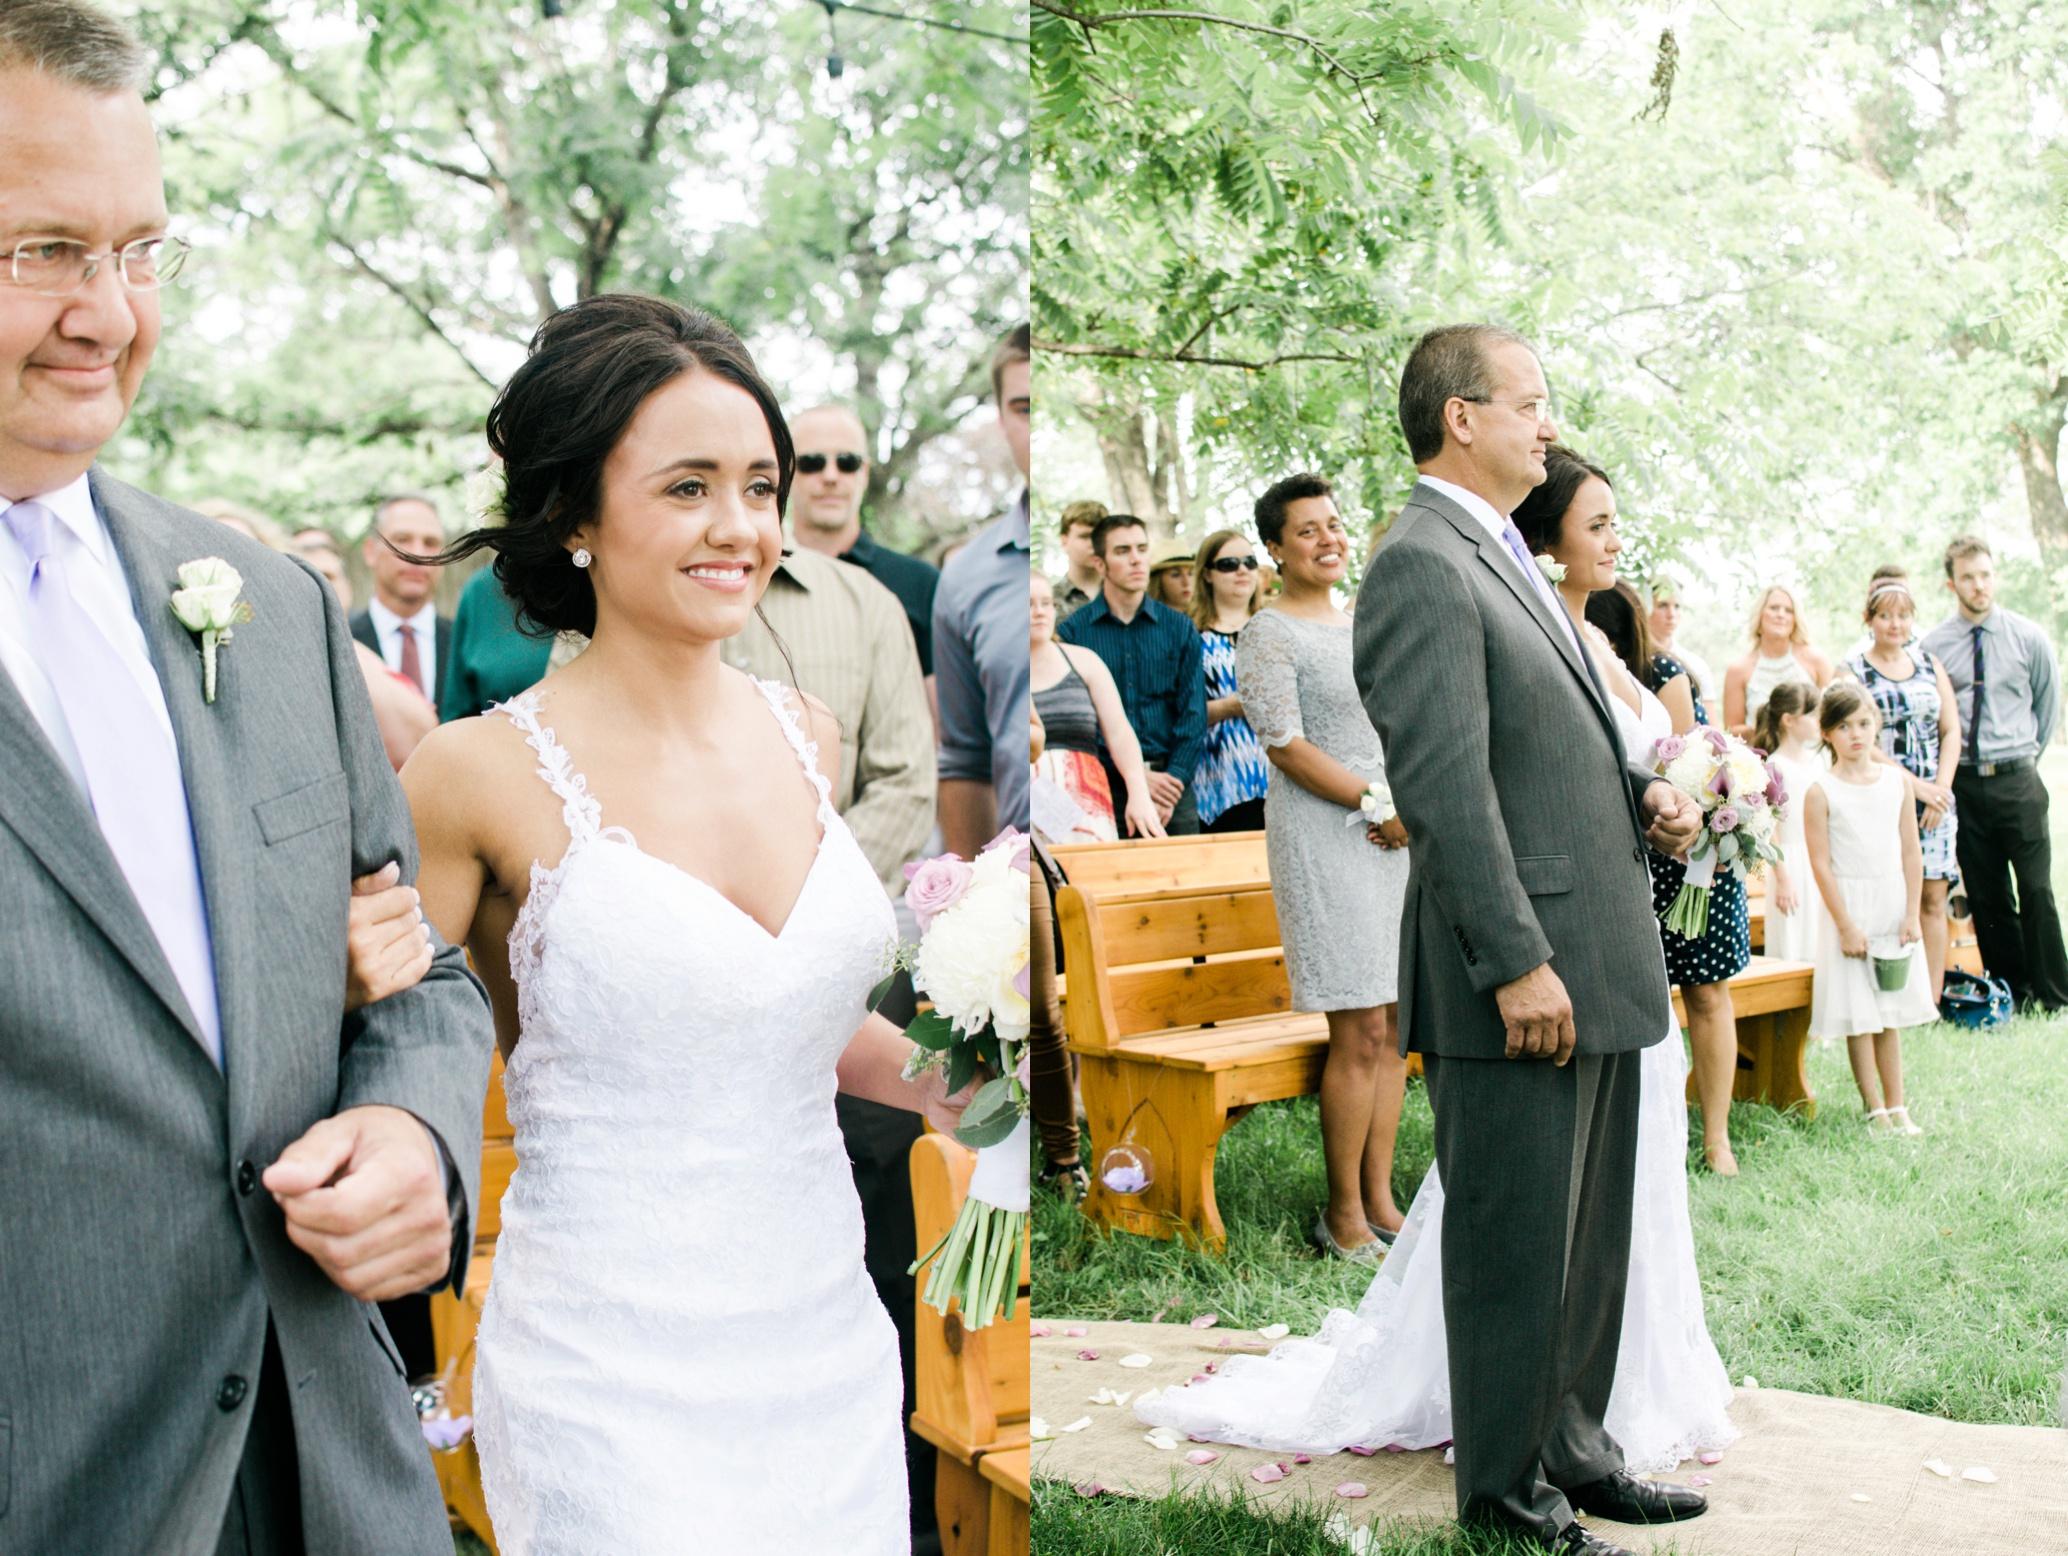 Barnes' Place Rustic Outdoor Wedding | Ali Leigh Photo Minneapolis Wedding Photographer_0133.jpg